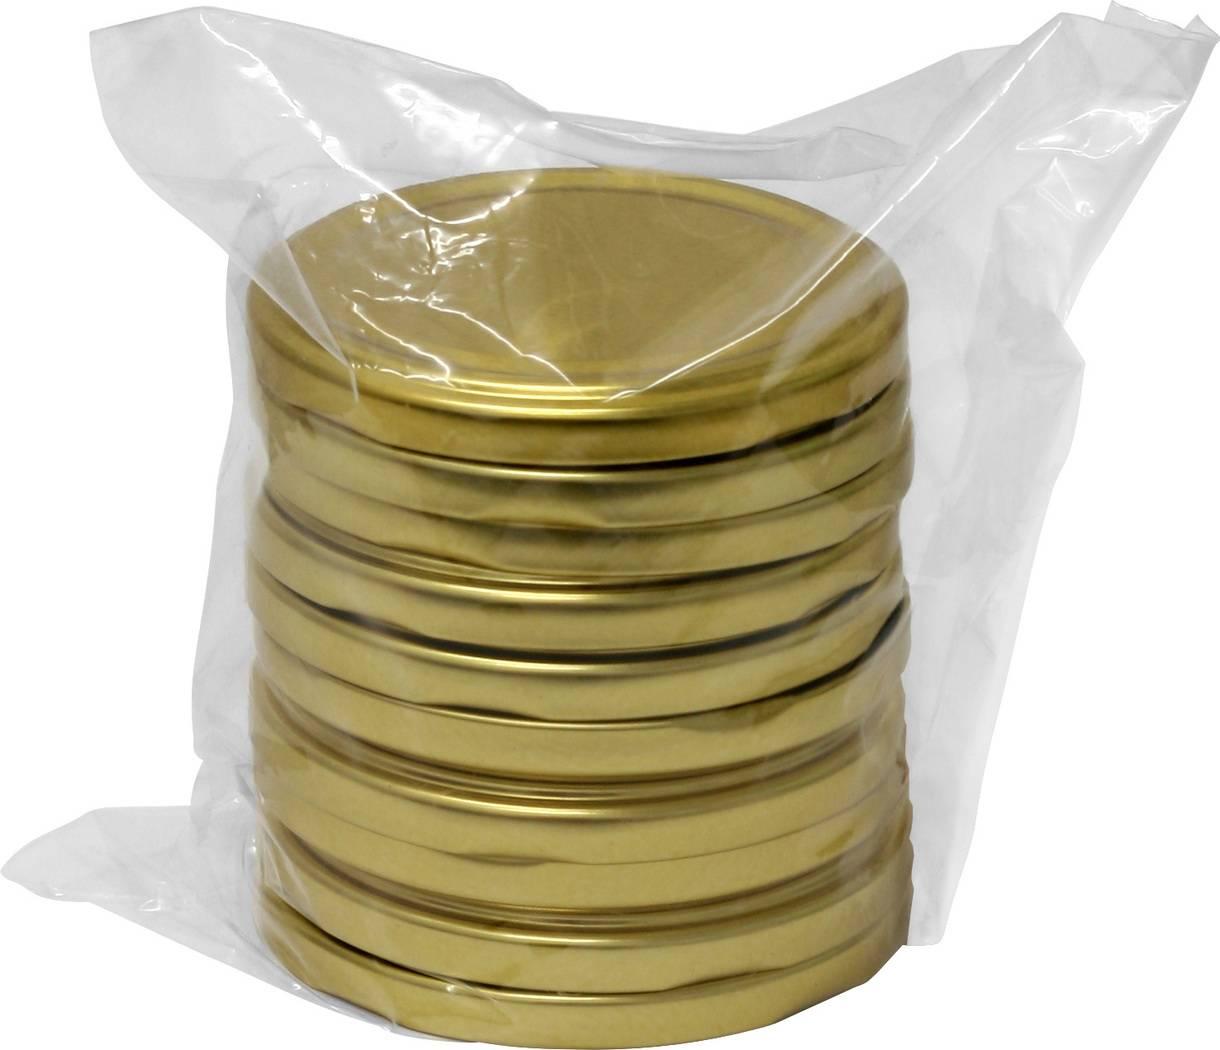 Víčka 82/6 - 10ks zlaté - BIOWIN